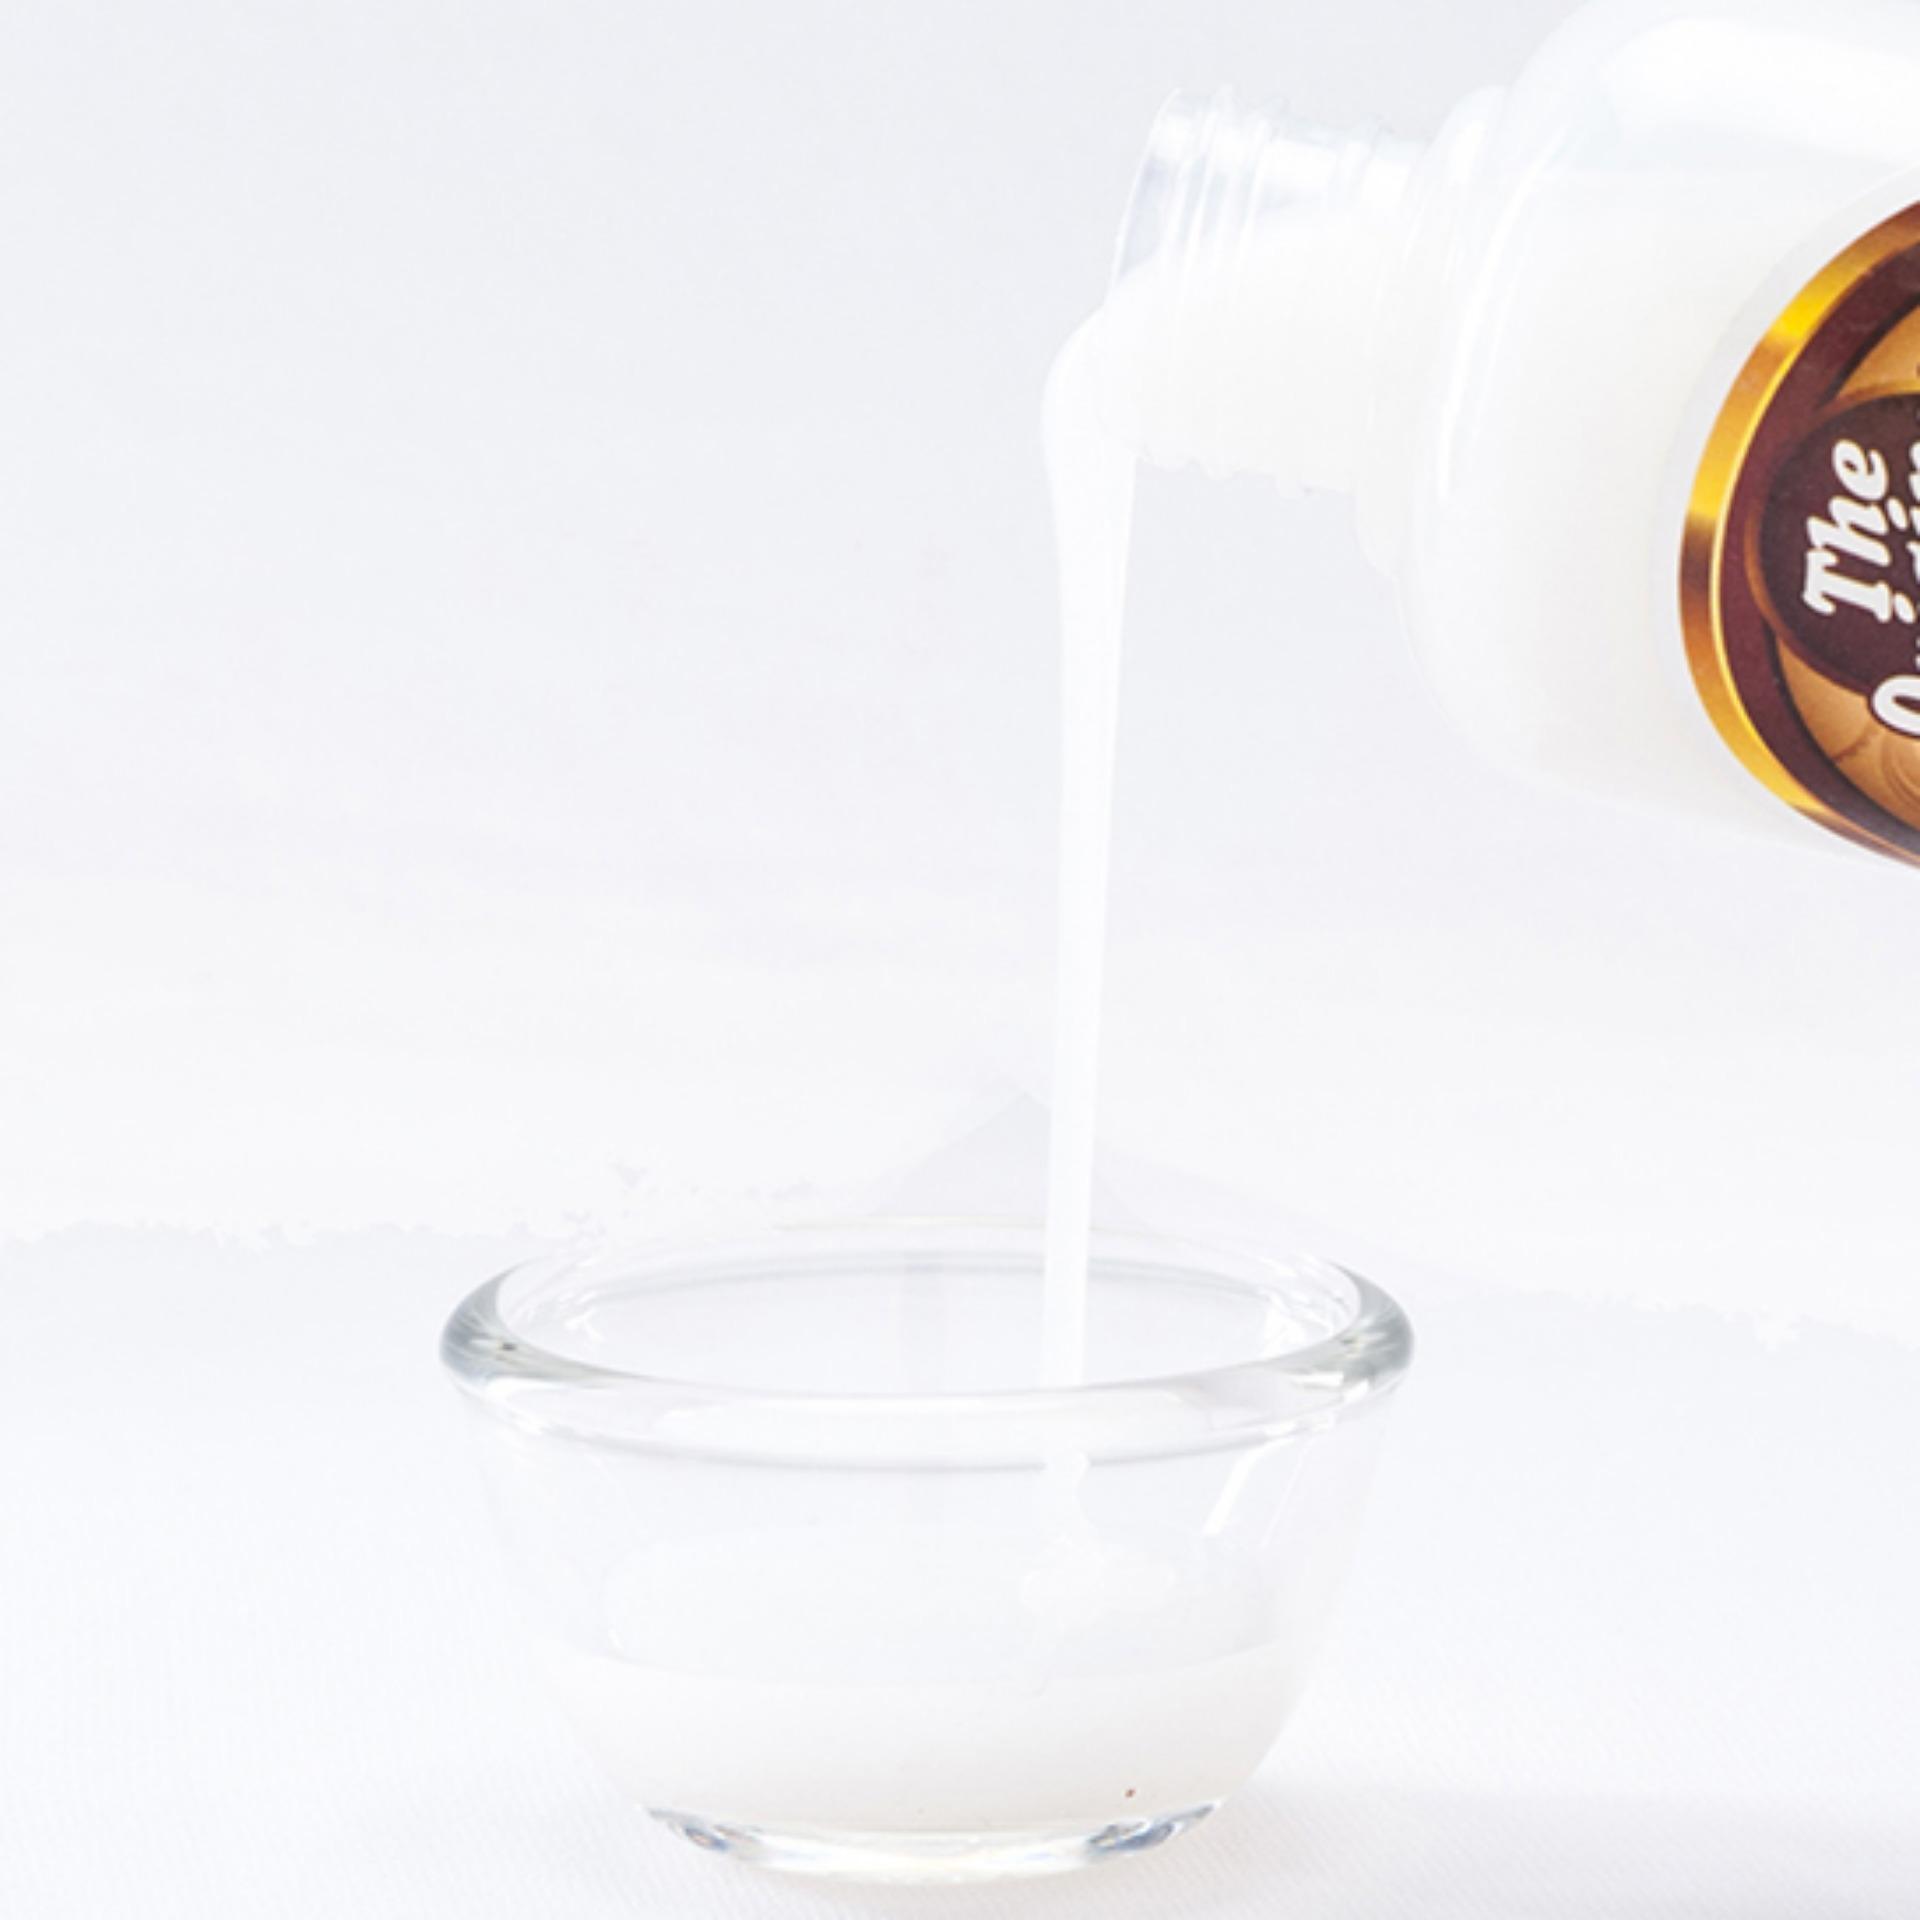 Harga Terendah The Caviar Shampo Kuda 250 Ml 4 Botol Belanja Murah Shampoo